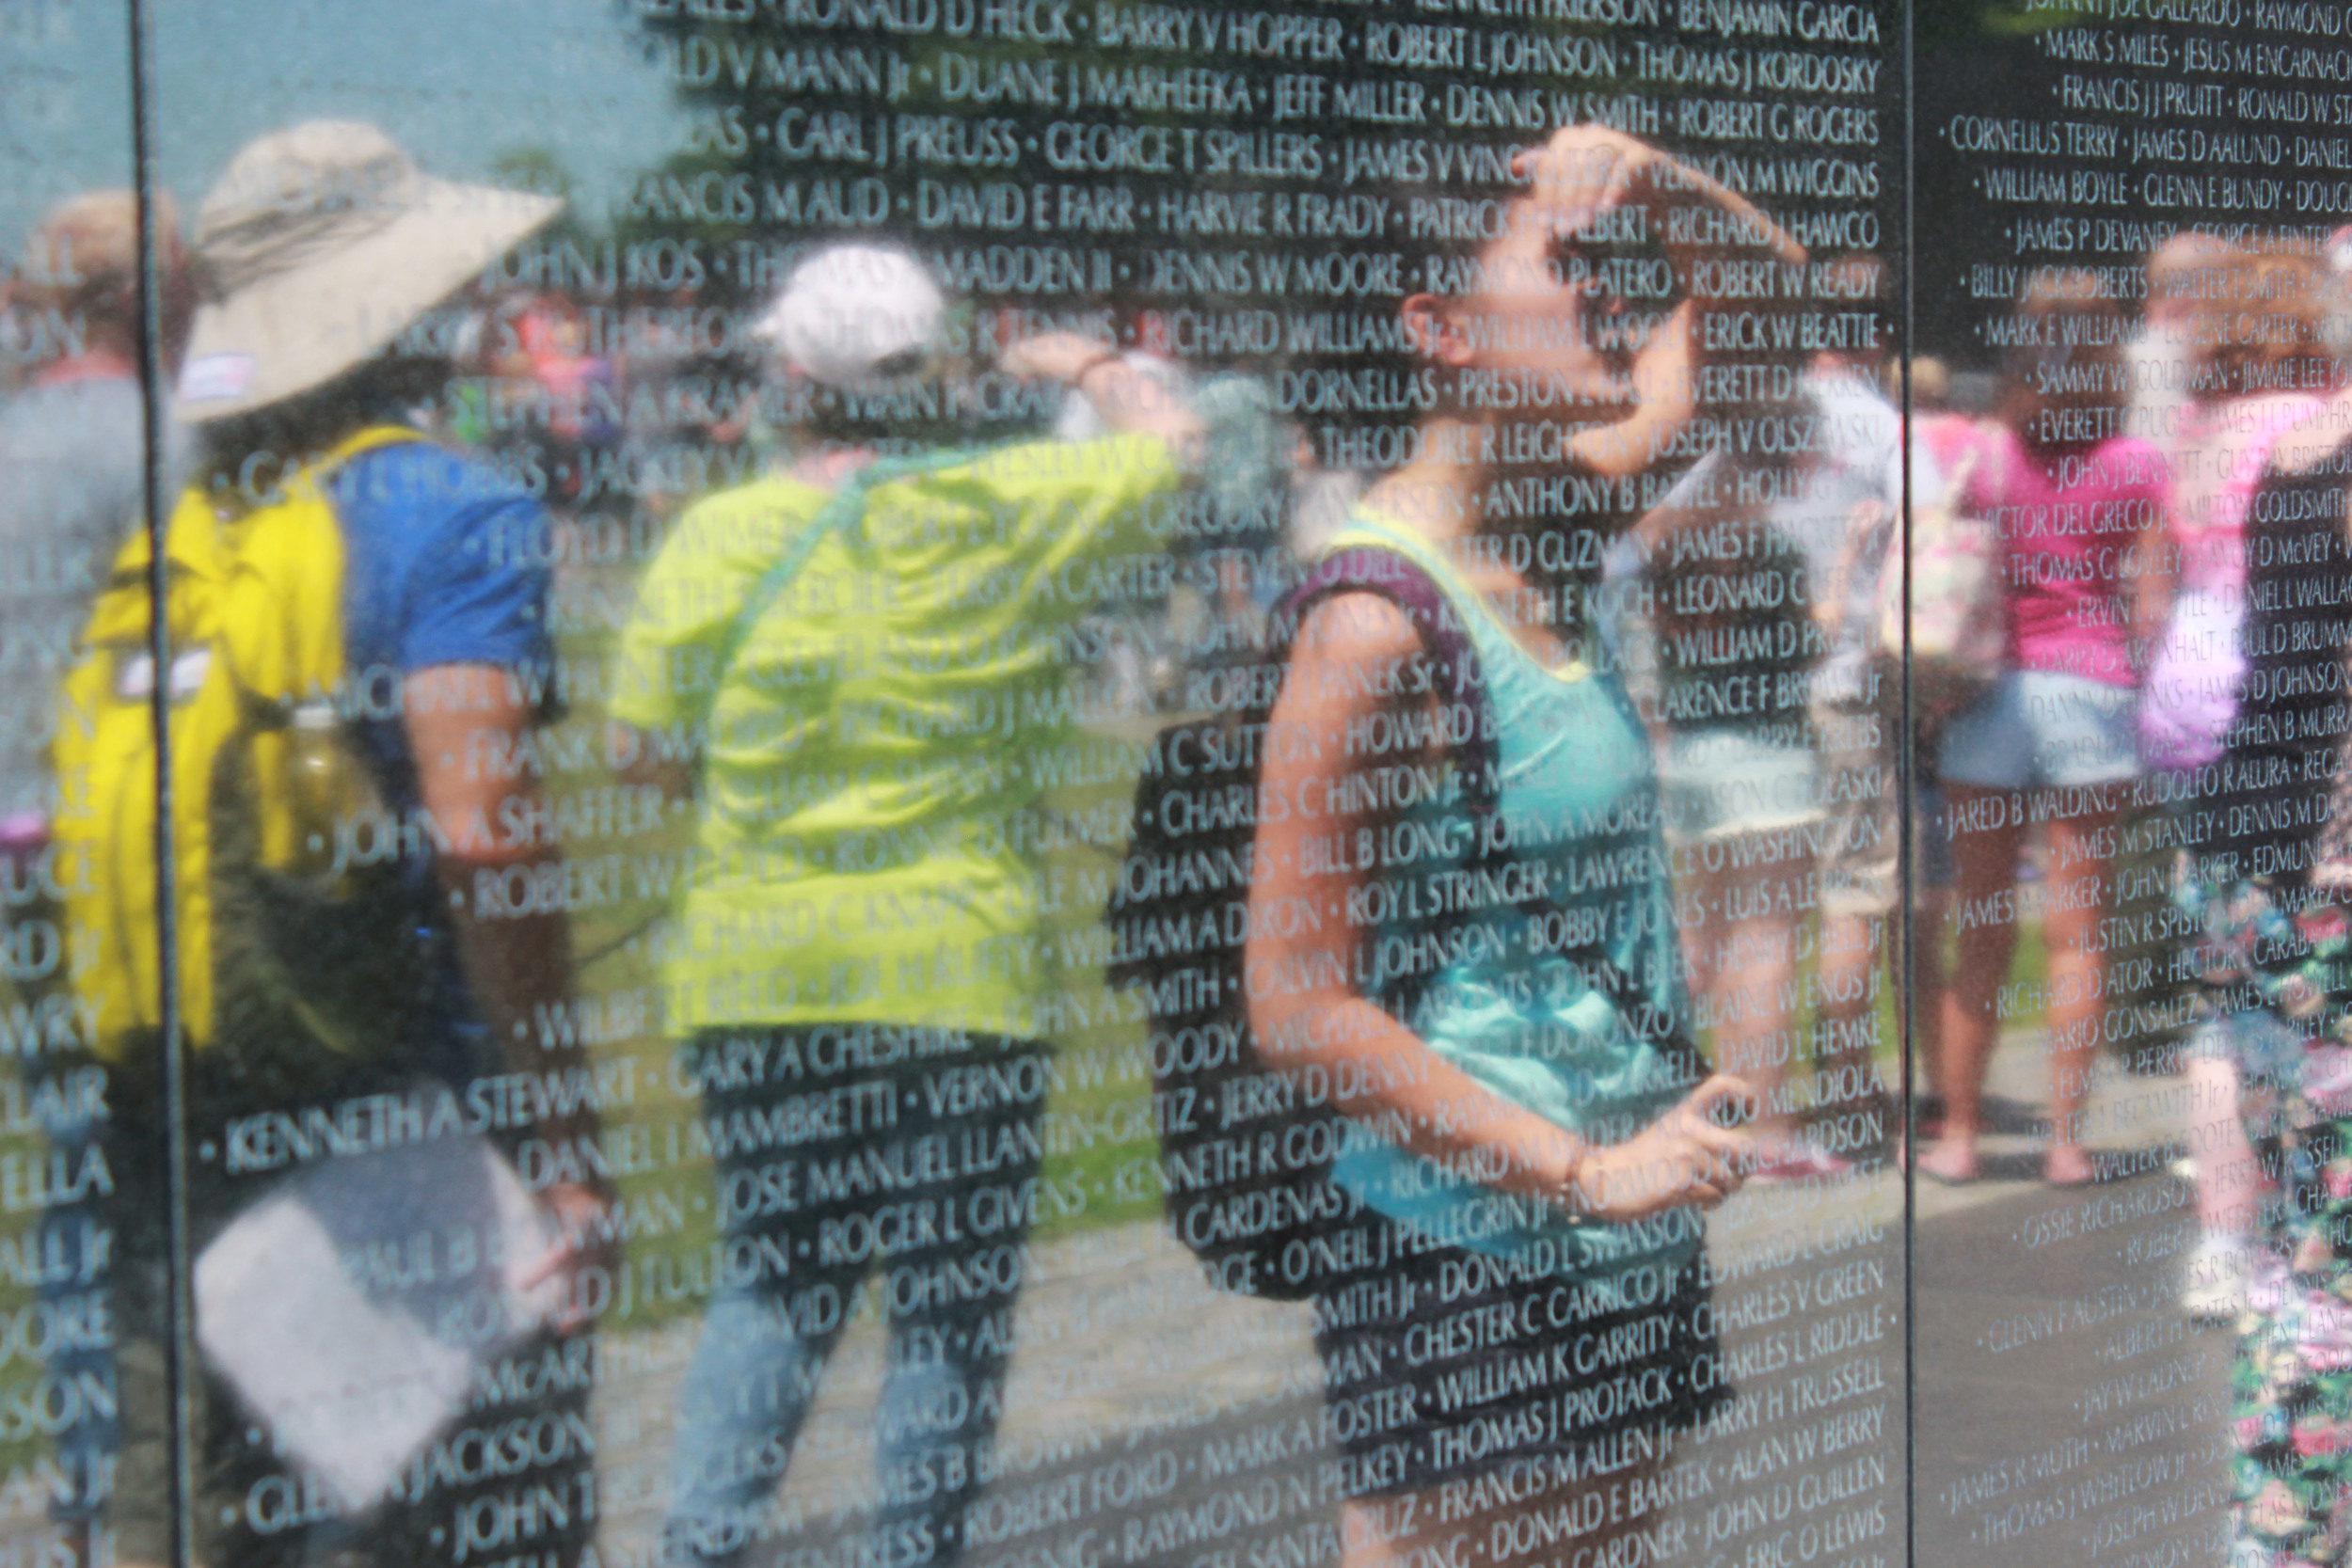 Jacqueline observing the Vietnam War Veterans Memorial.